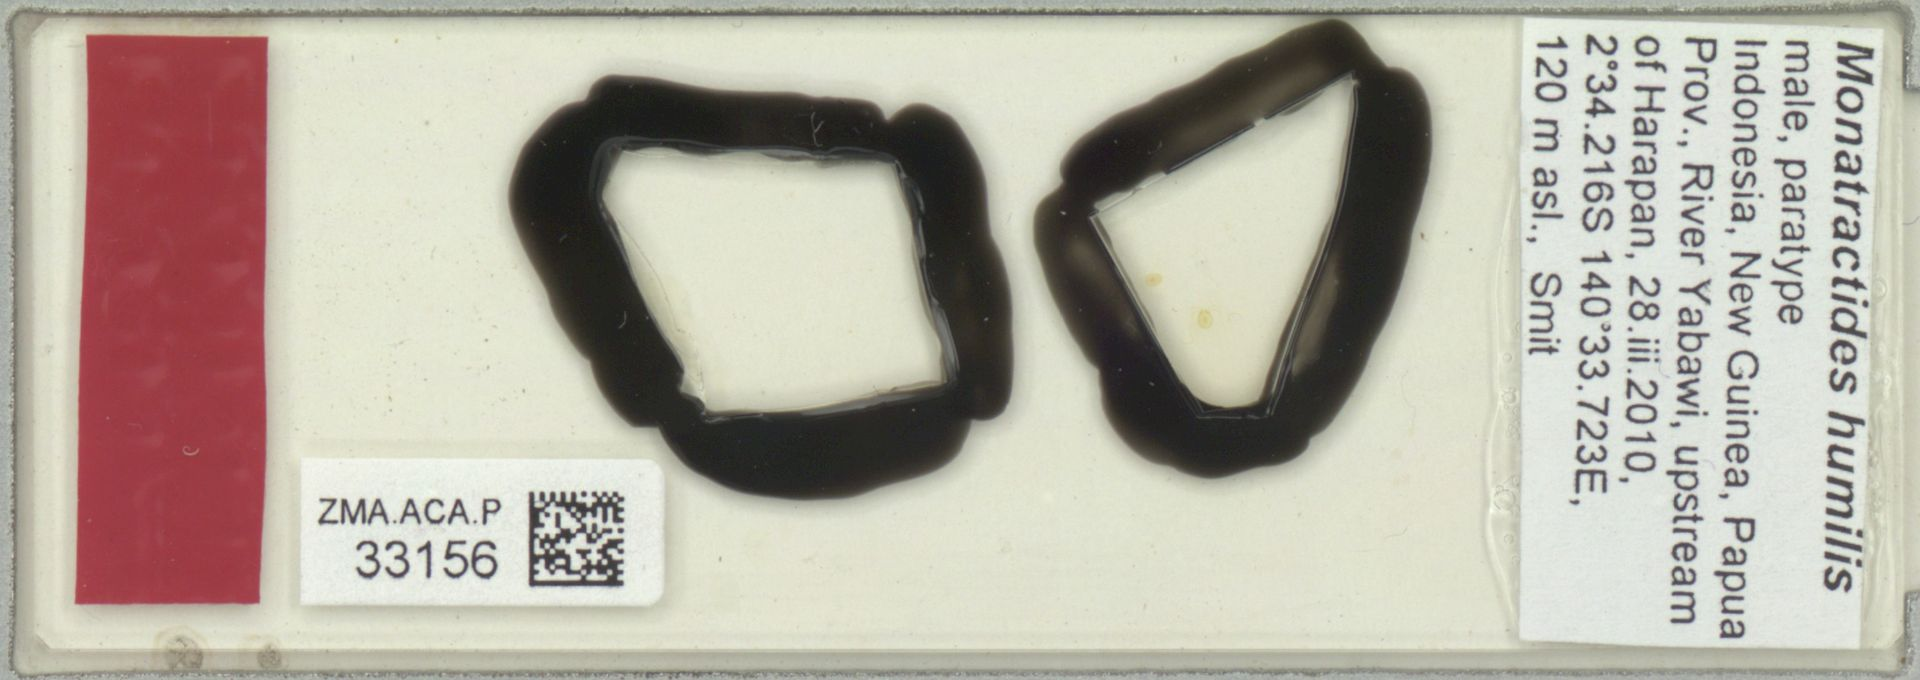 ZMA.ACA.P.33156 | Monatractides humilis Pesic & Smit, 2011